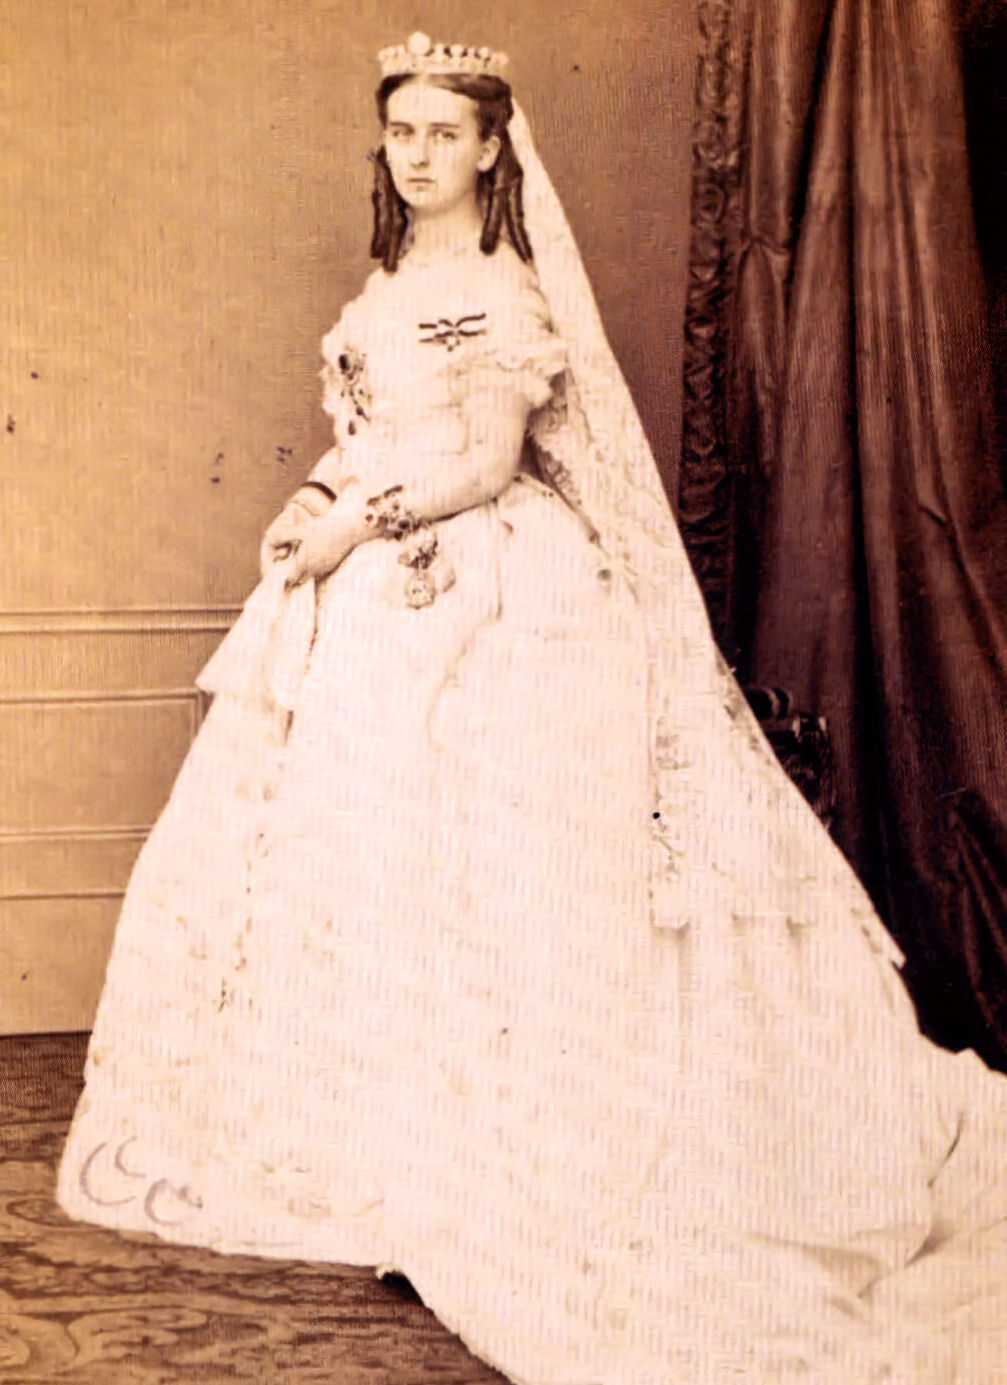 Princess Marie of Hohenzollern-Sigmaringen